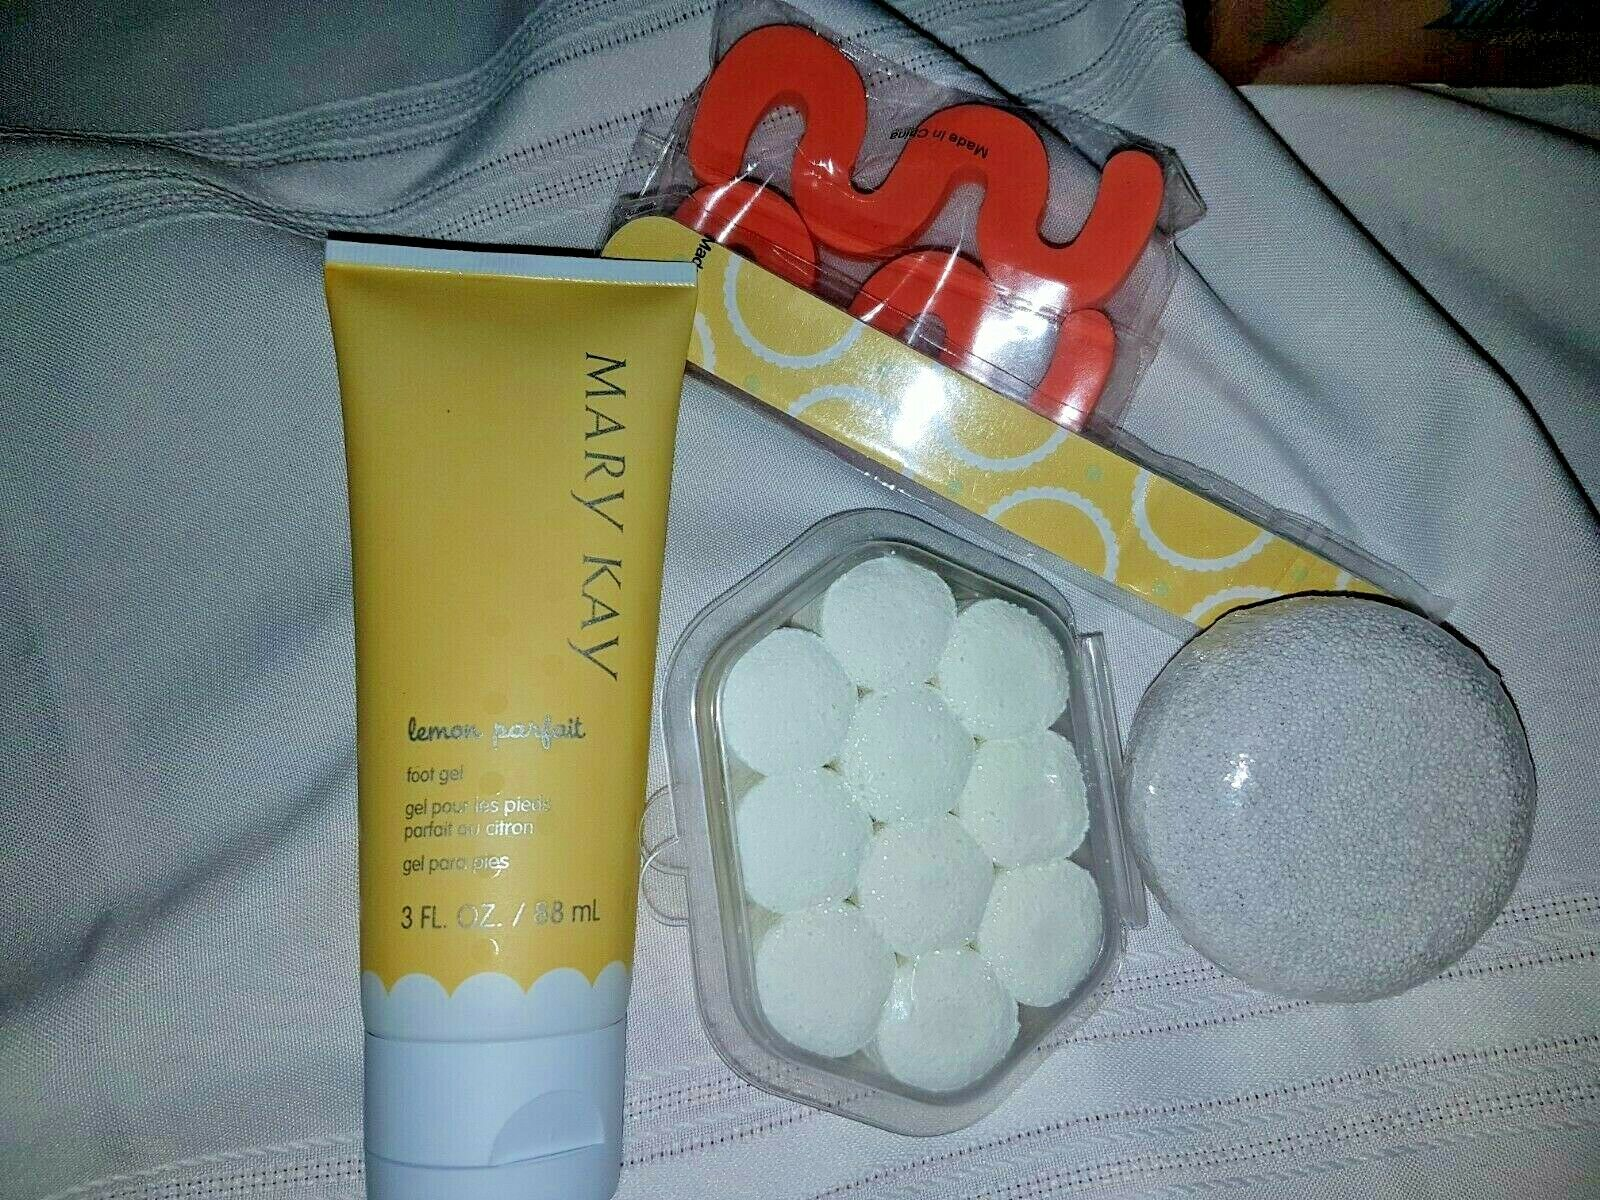 MARY KAY~PEDICURE NAIL CARE PRODUCTS SET! Lemon Parfait